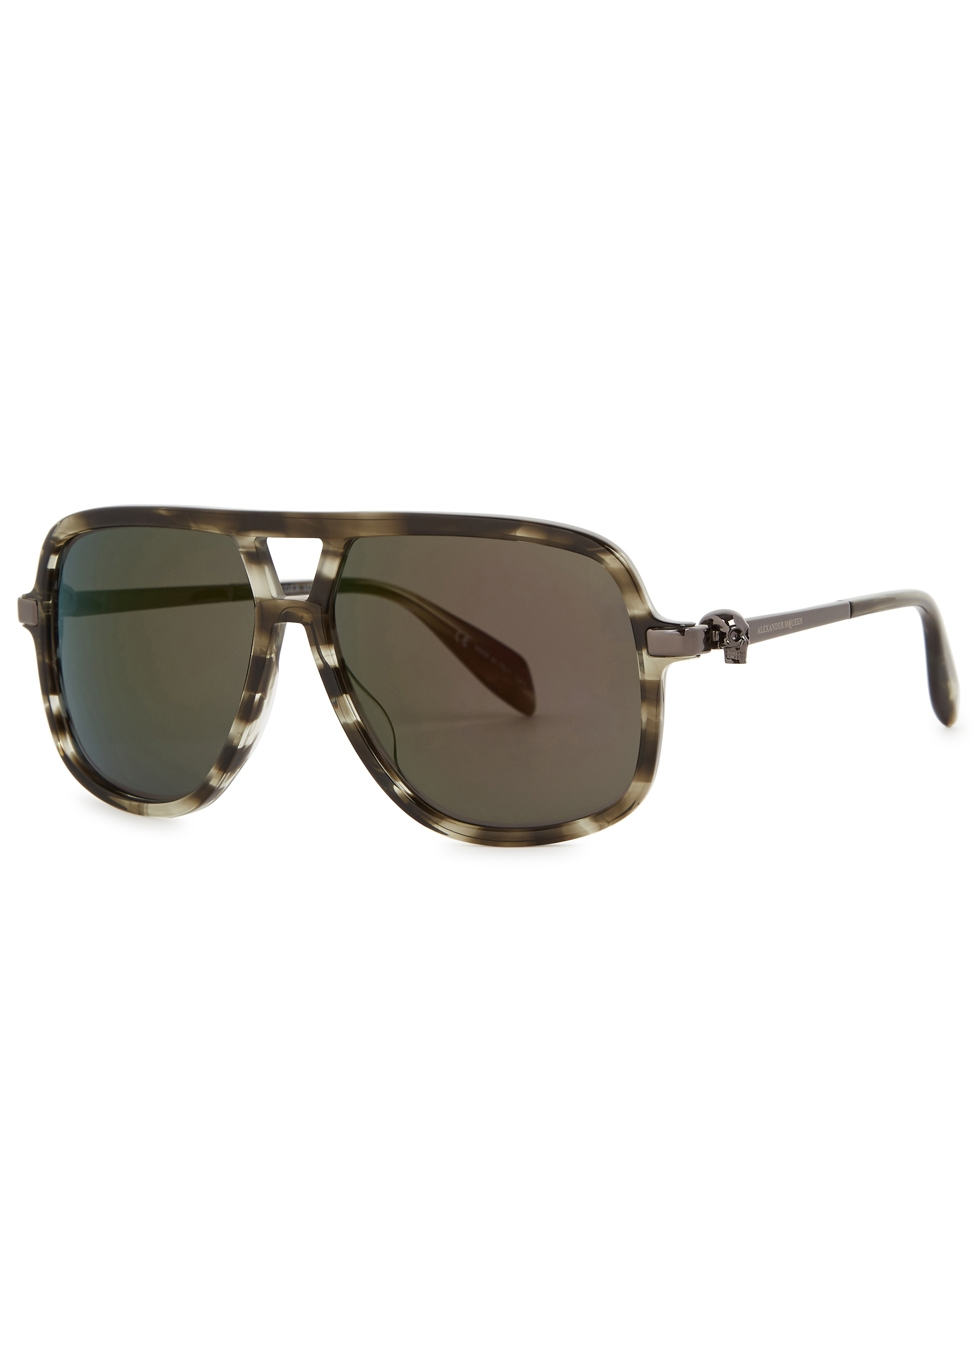 Grey tortoiseshell mirrored D-frame sunglasses - Alexander McQueen